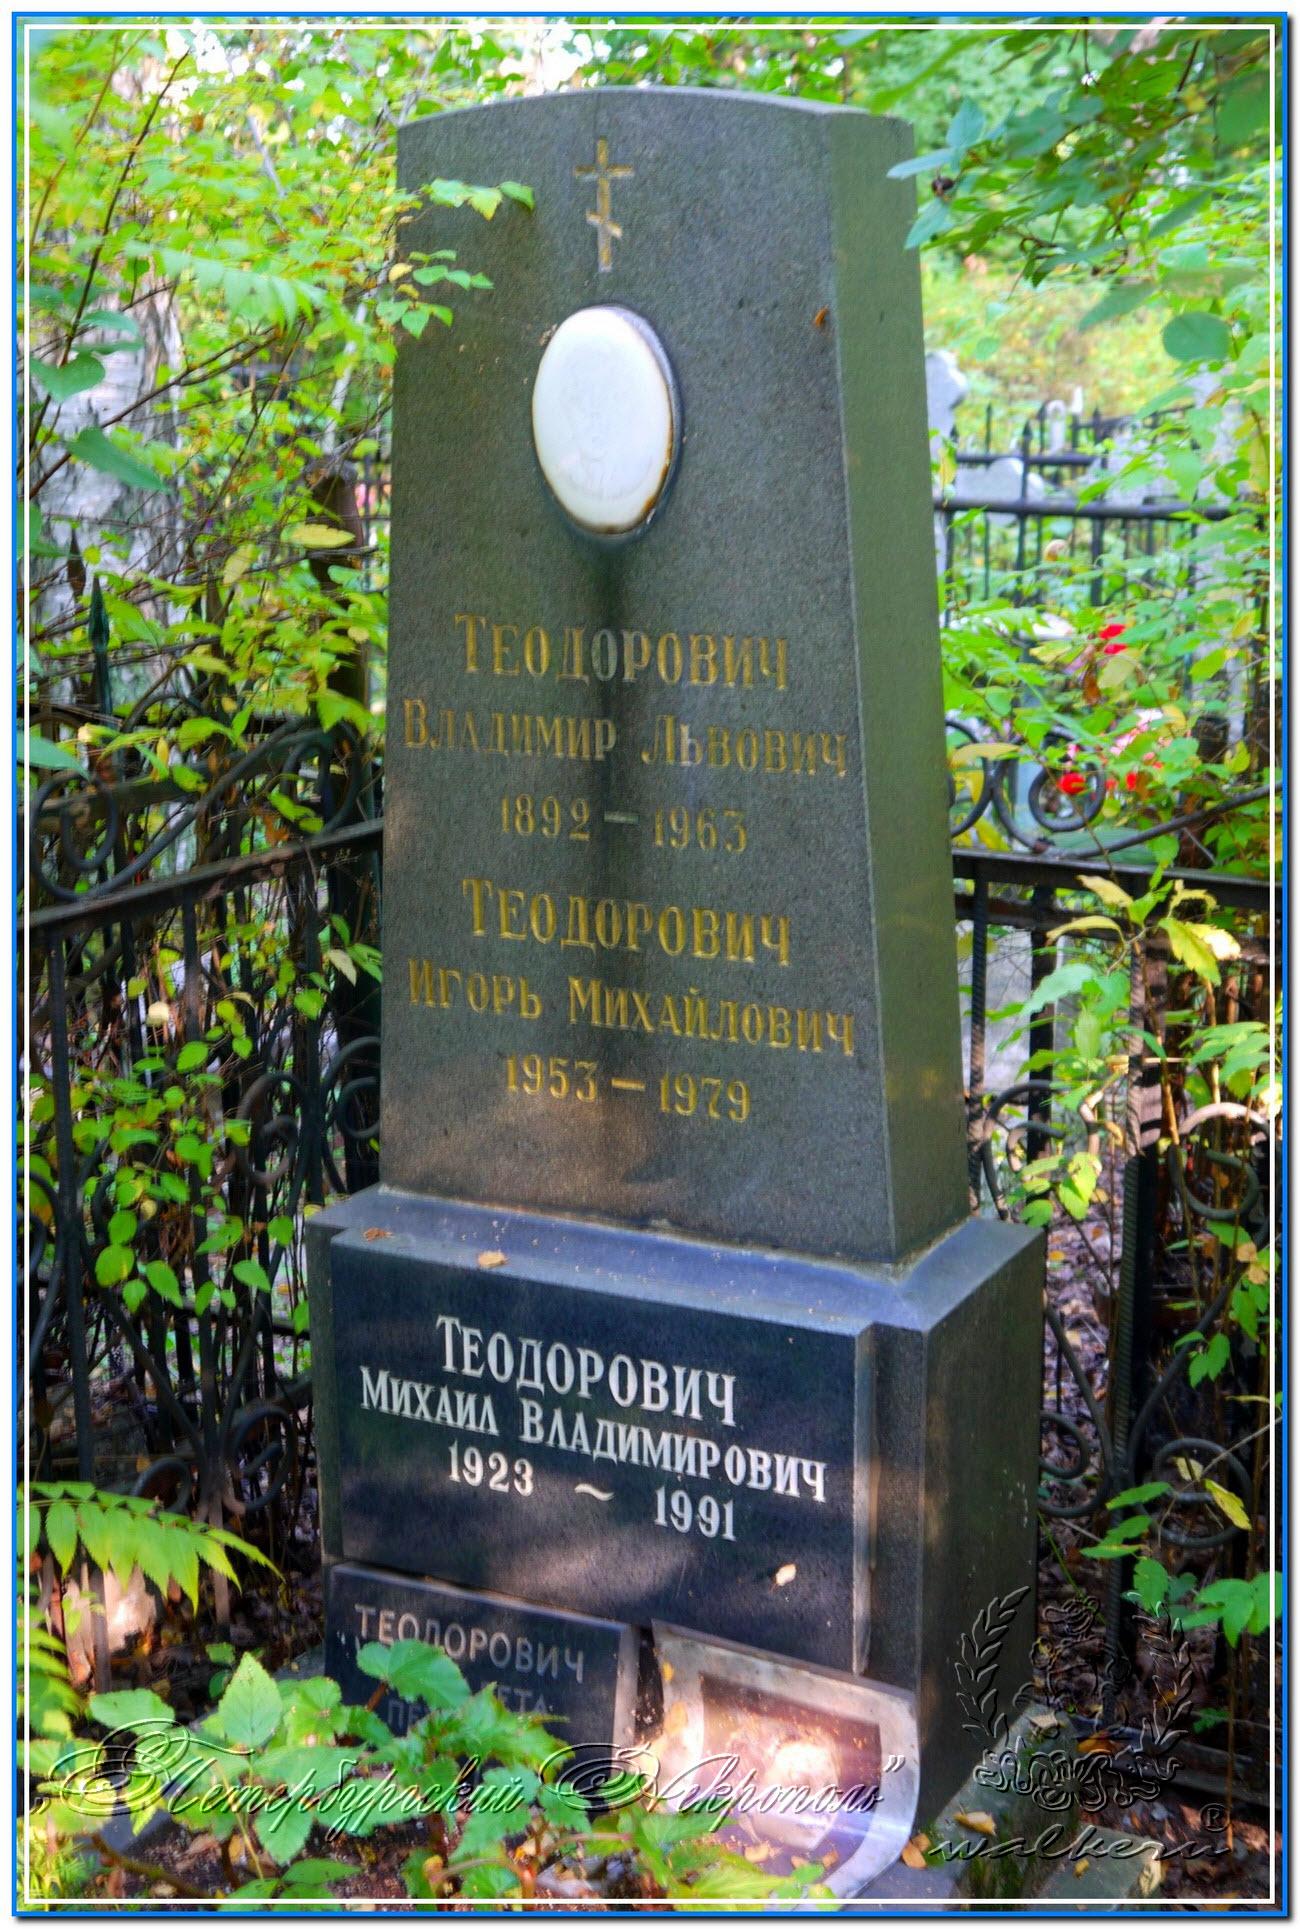 Теодорович Михаил Владимирович